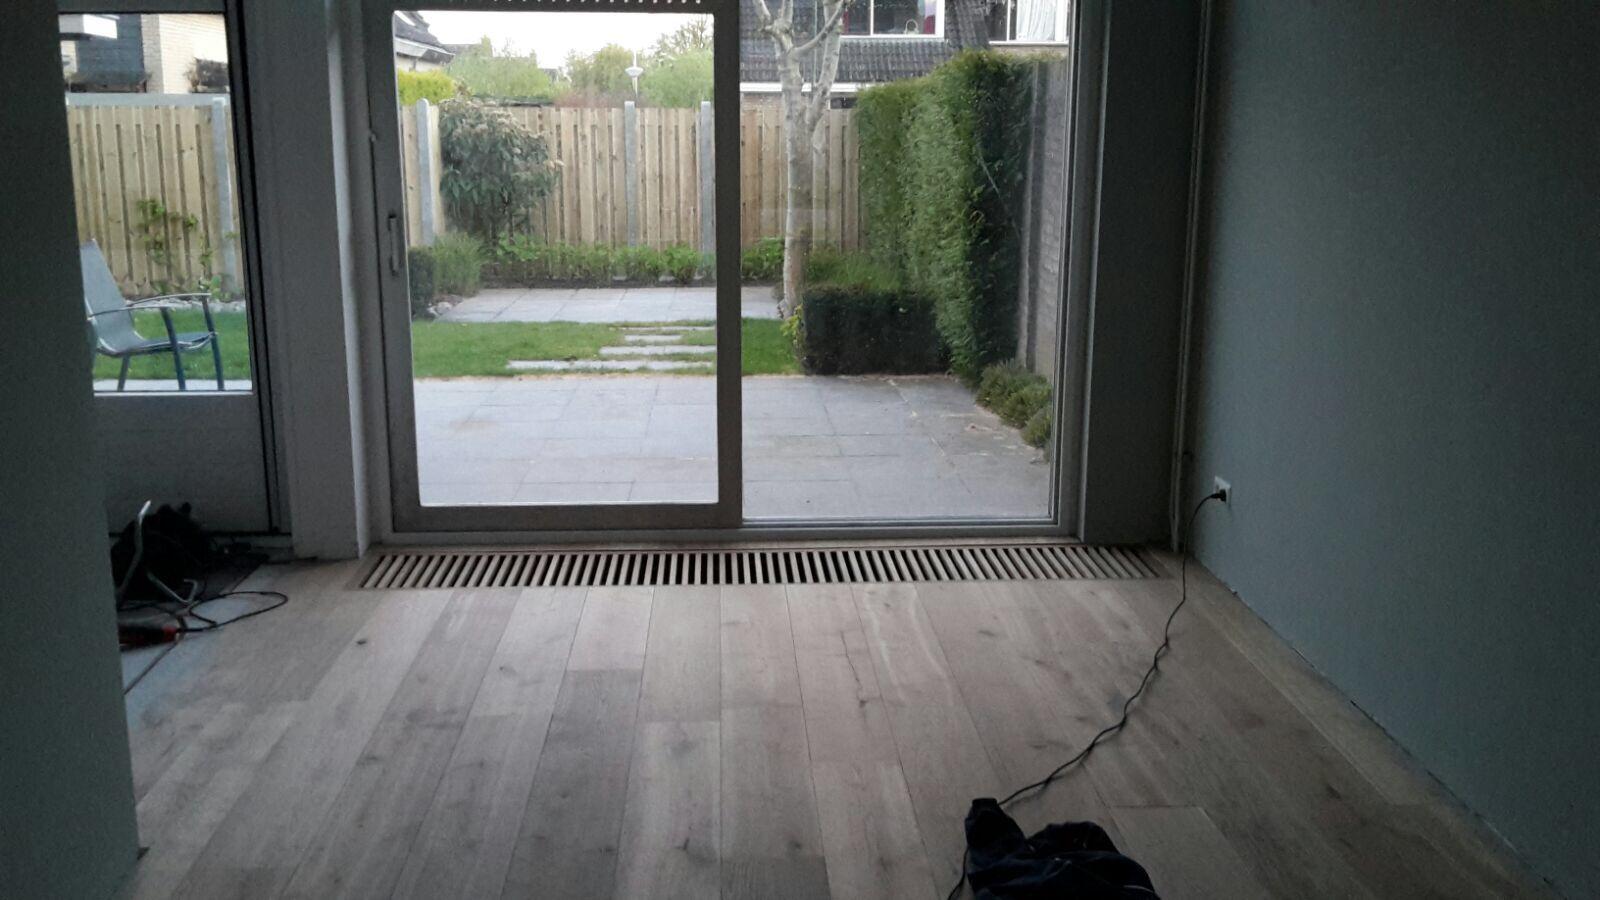 Blokrooster voor convectorput gerookt eiken vloer strak gelegd